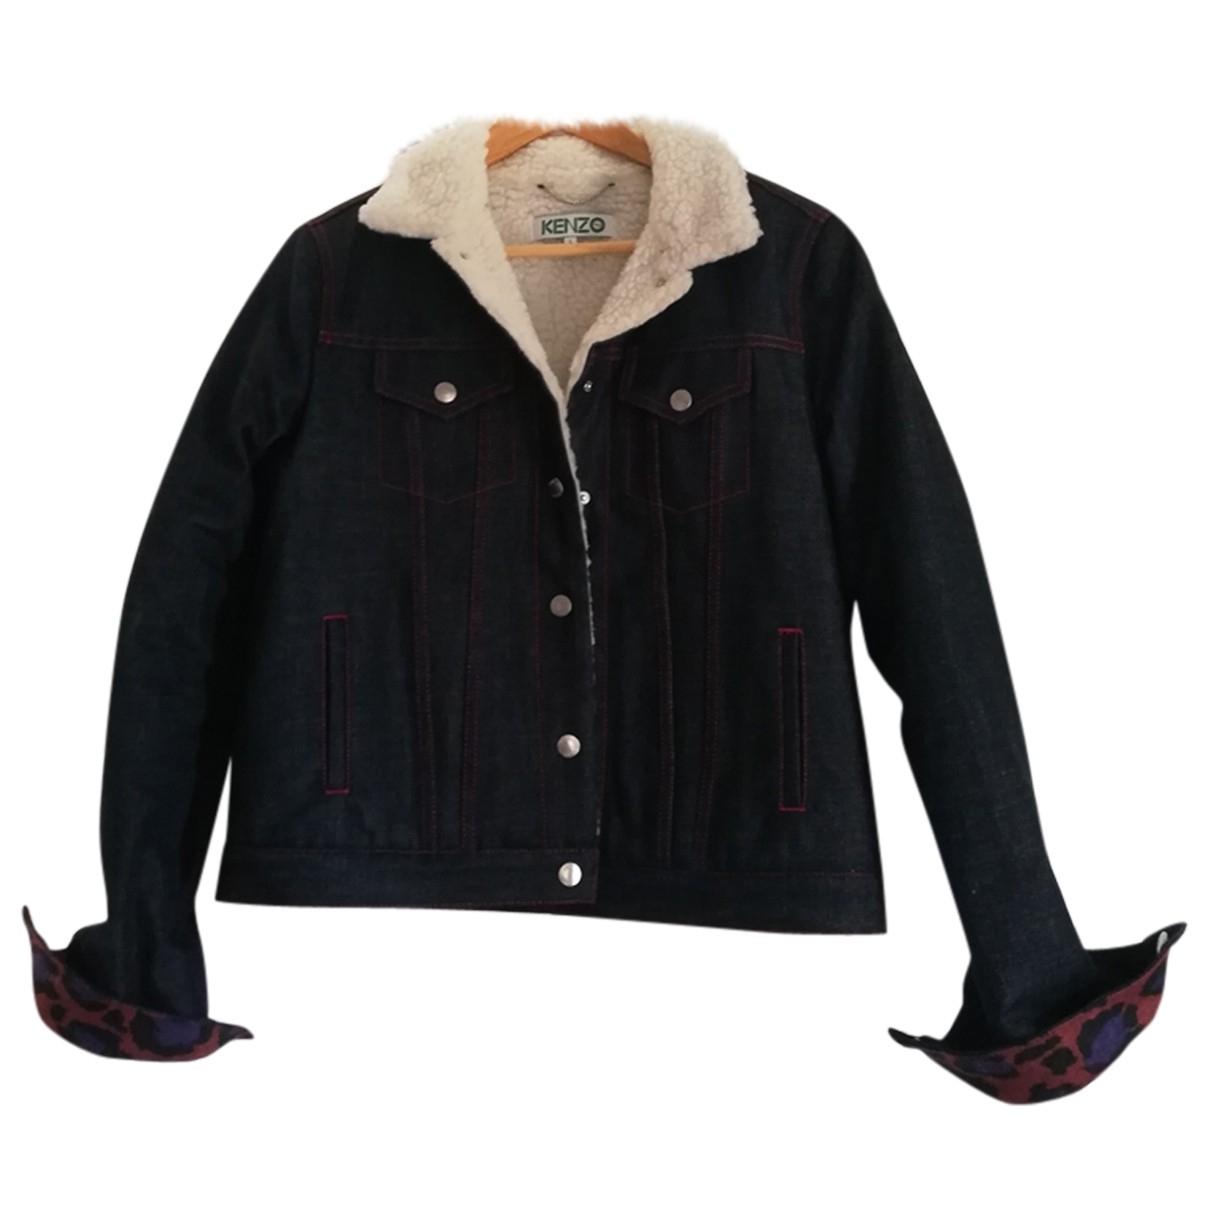 Kenzo \N Navy Denim - Jeans jacket for Women L International